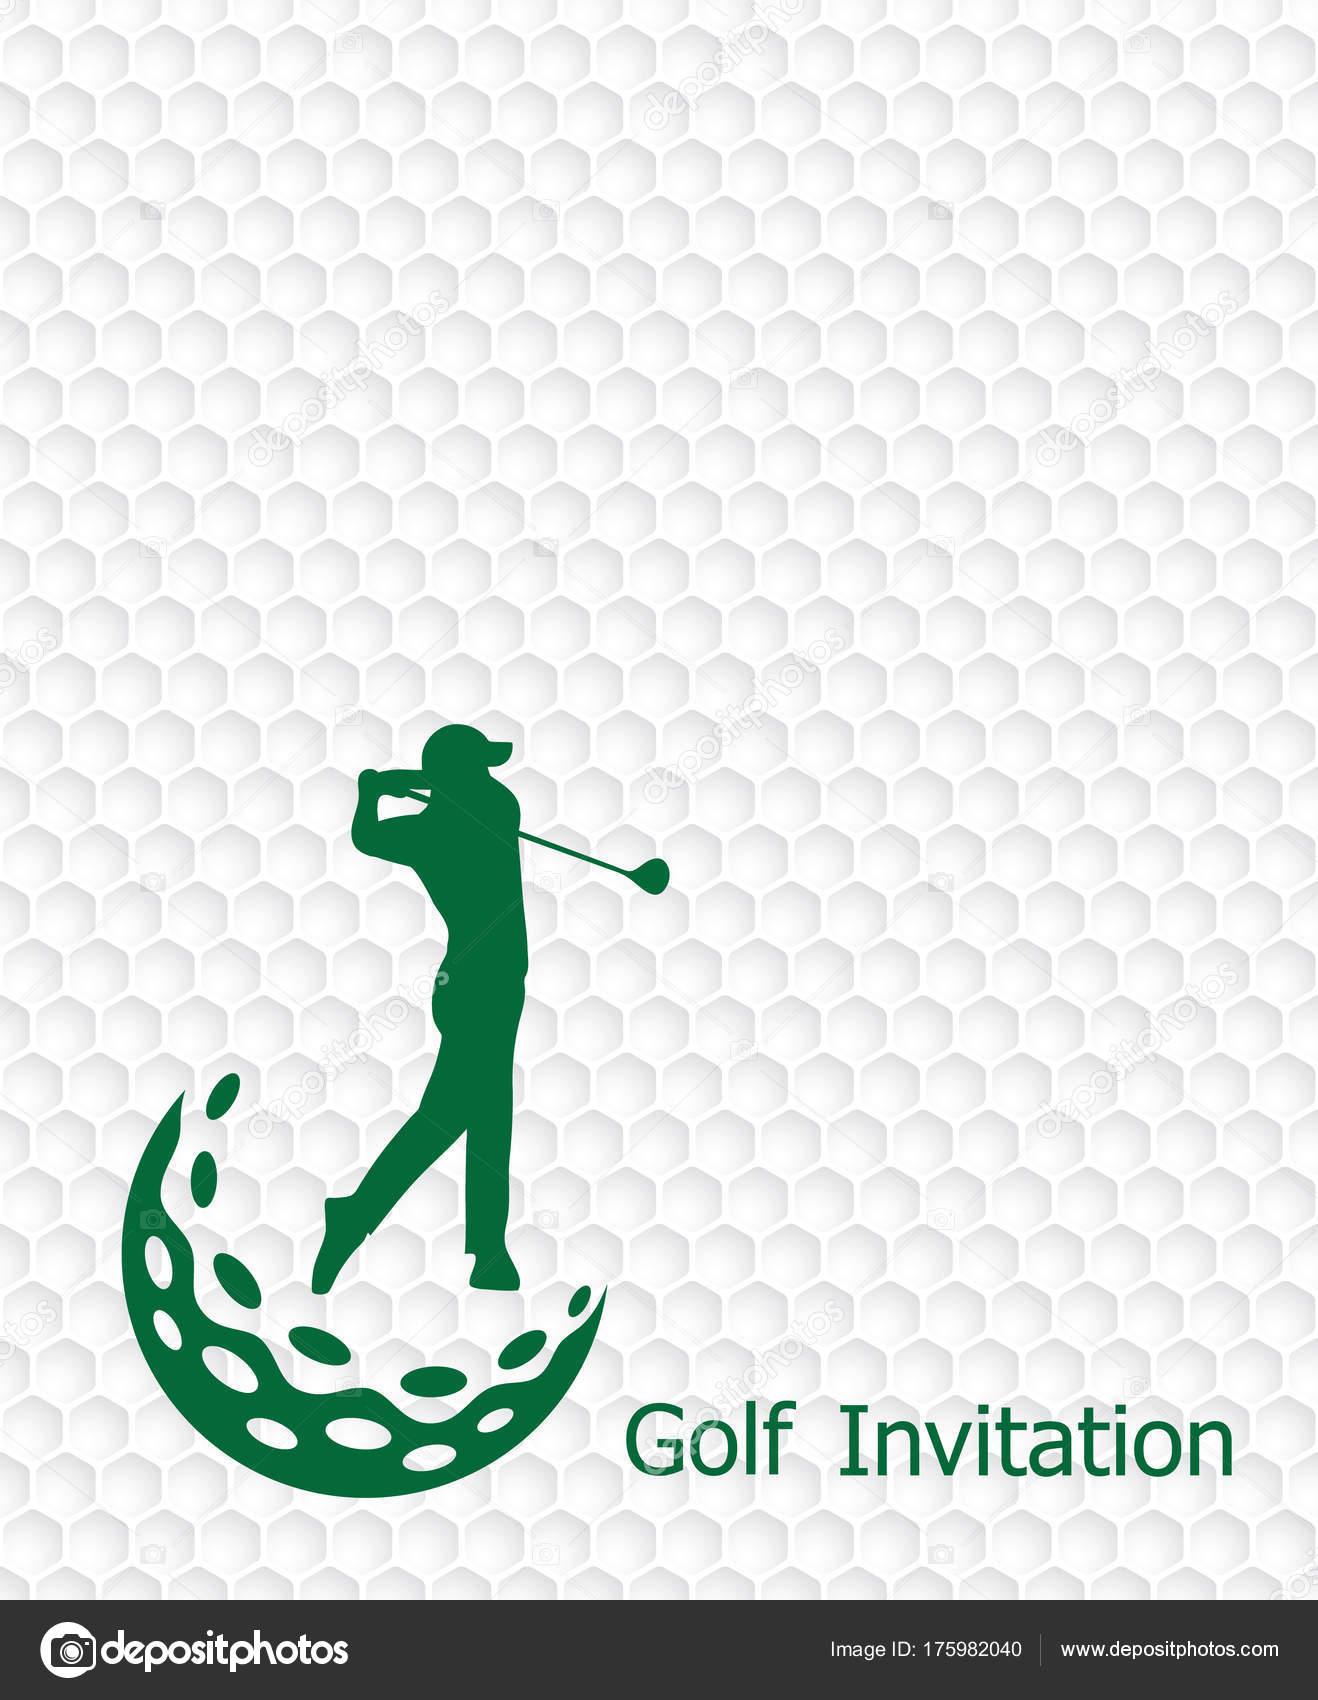 Golf tournament invitation flyer template graphic design golfer golf tournament invitation flyer template graphic design golfer swinging golfball stock vector stopboris Choice Image